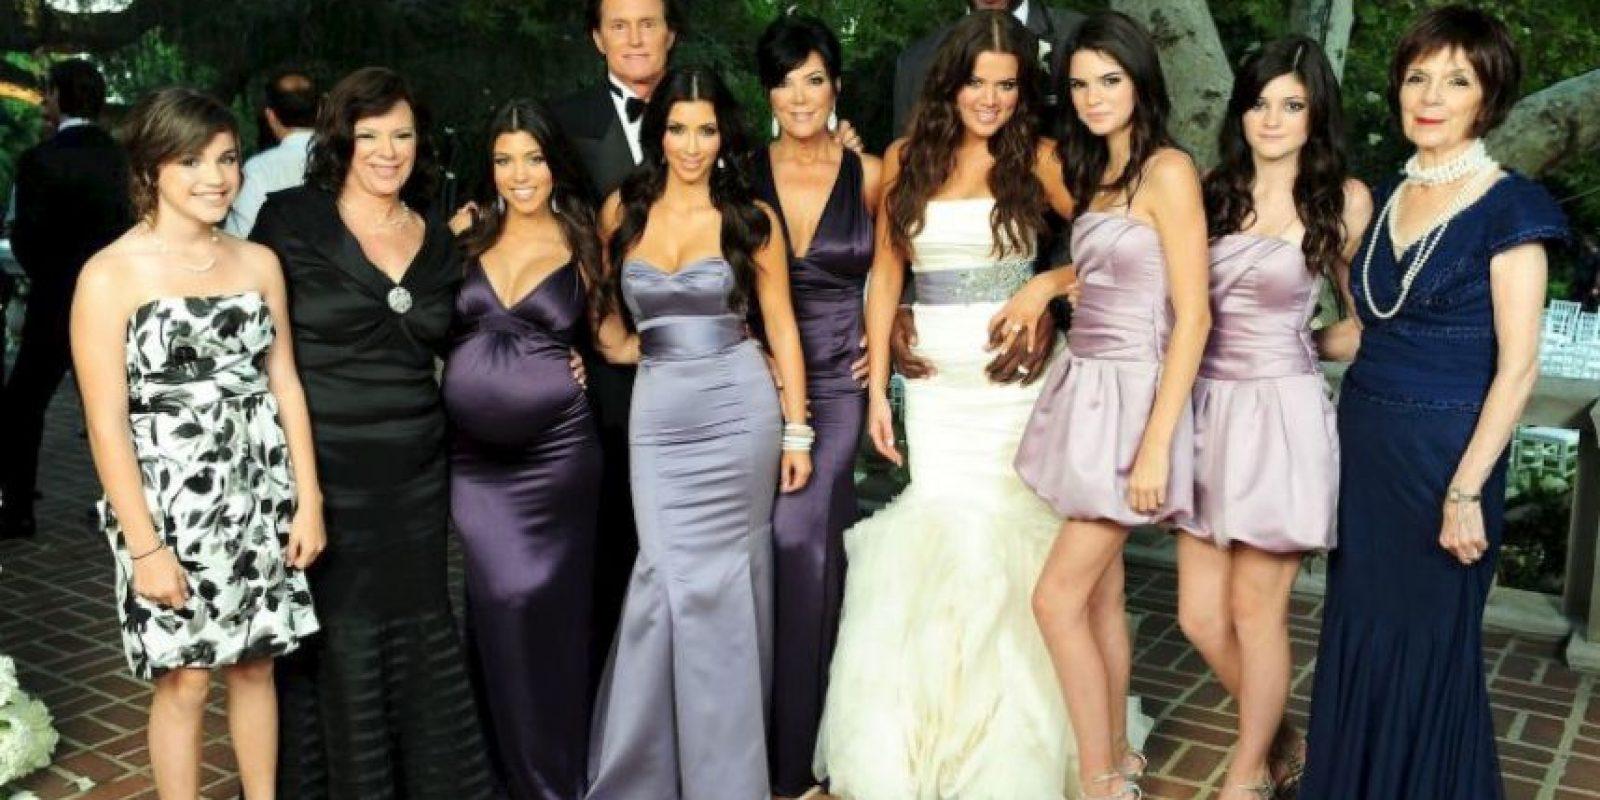 ¿Volverá Odom a ser parte de la familia Kardashian? Foto:The Grosby Group